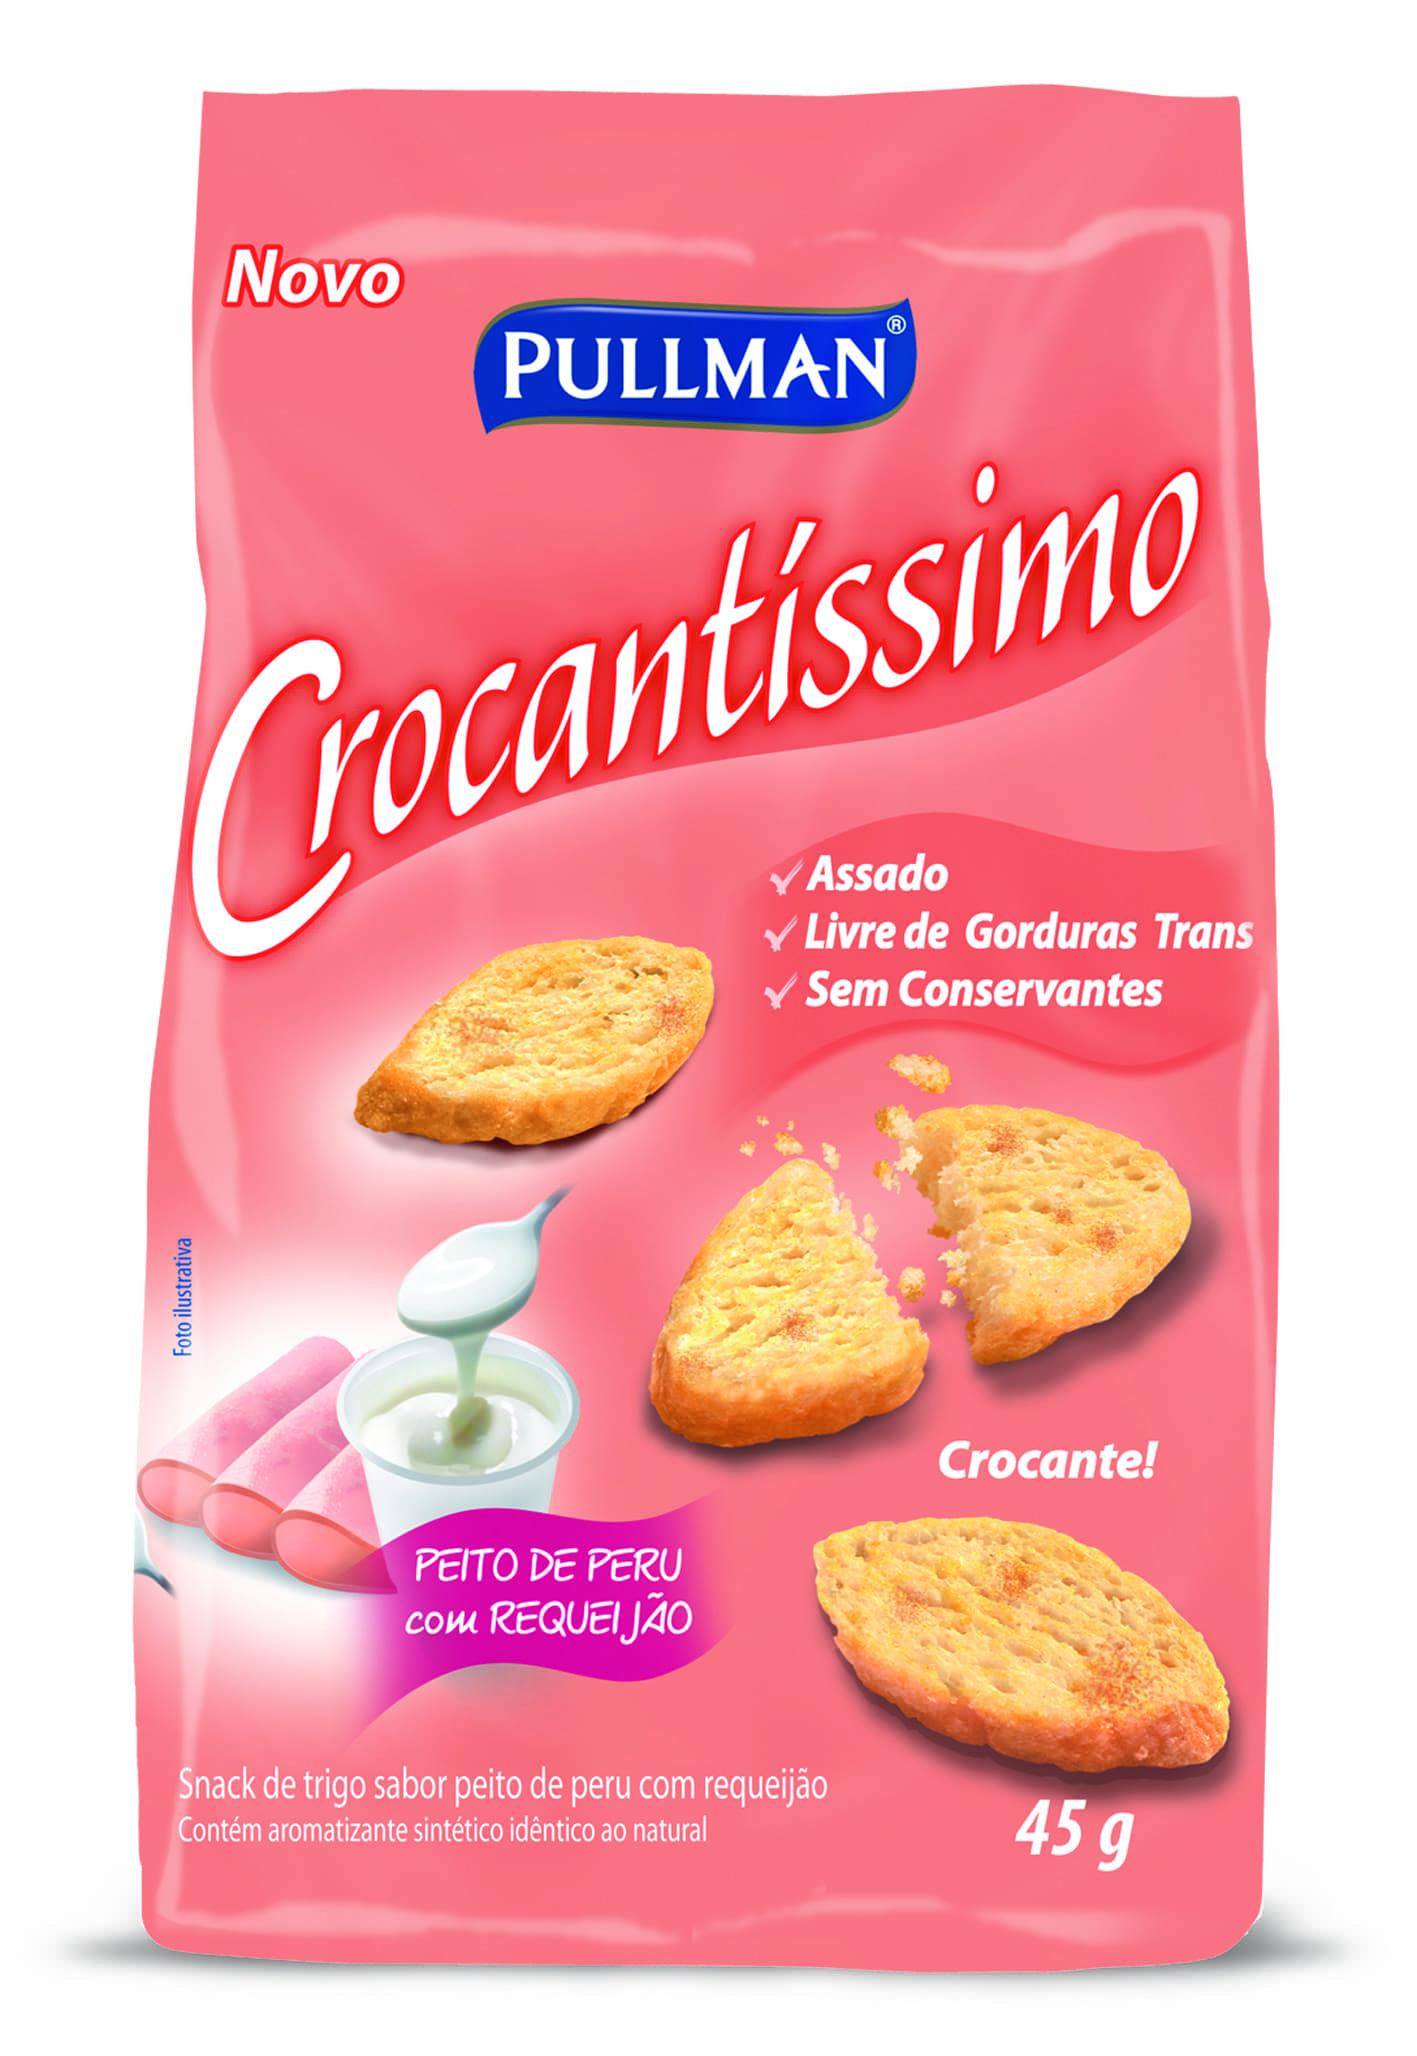 Crocantissimo_peito-de-peru_PULLMAN